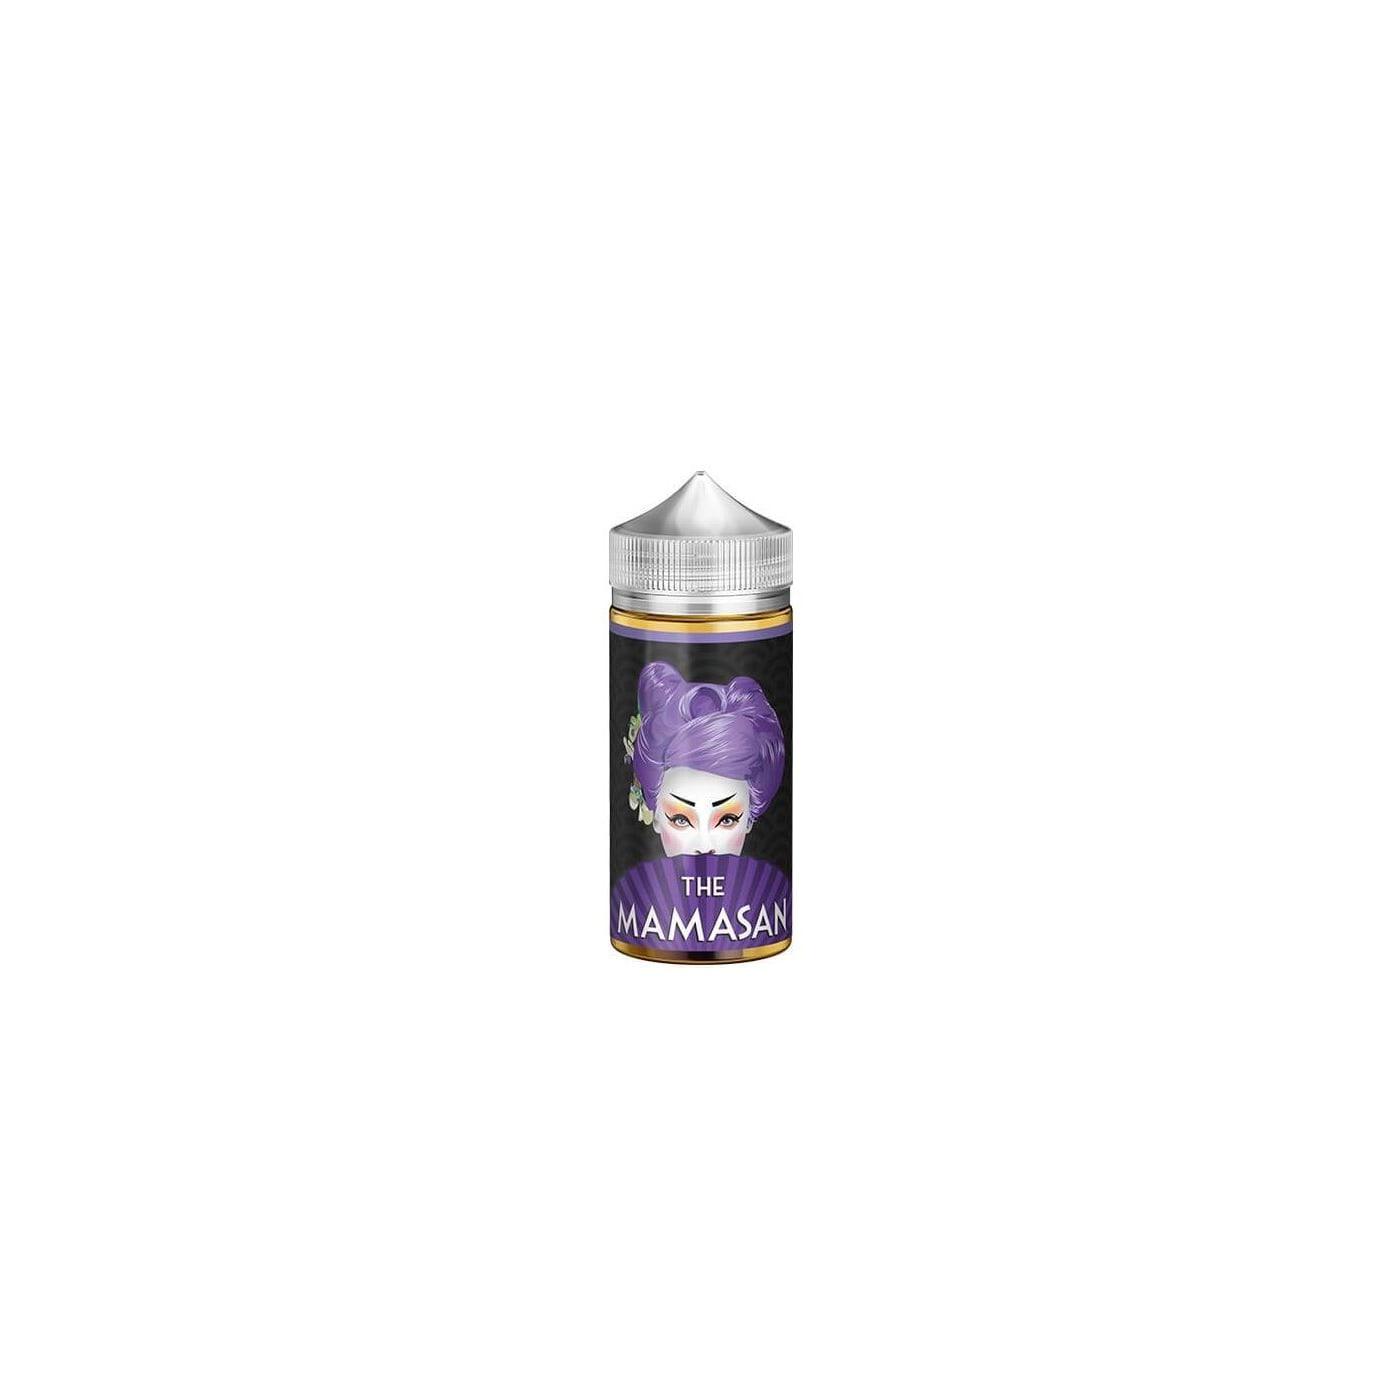 The Mamasan Purple Cheesecake 100ml E-Juice